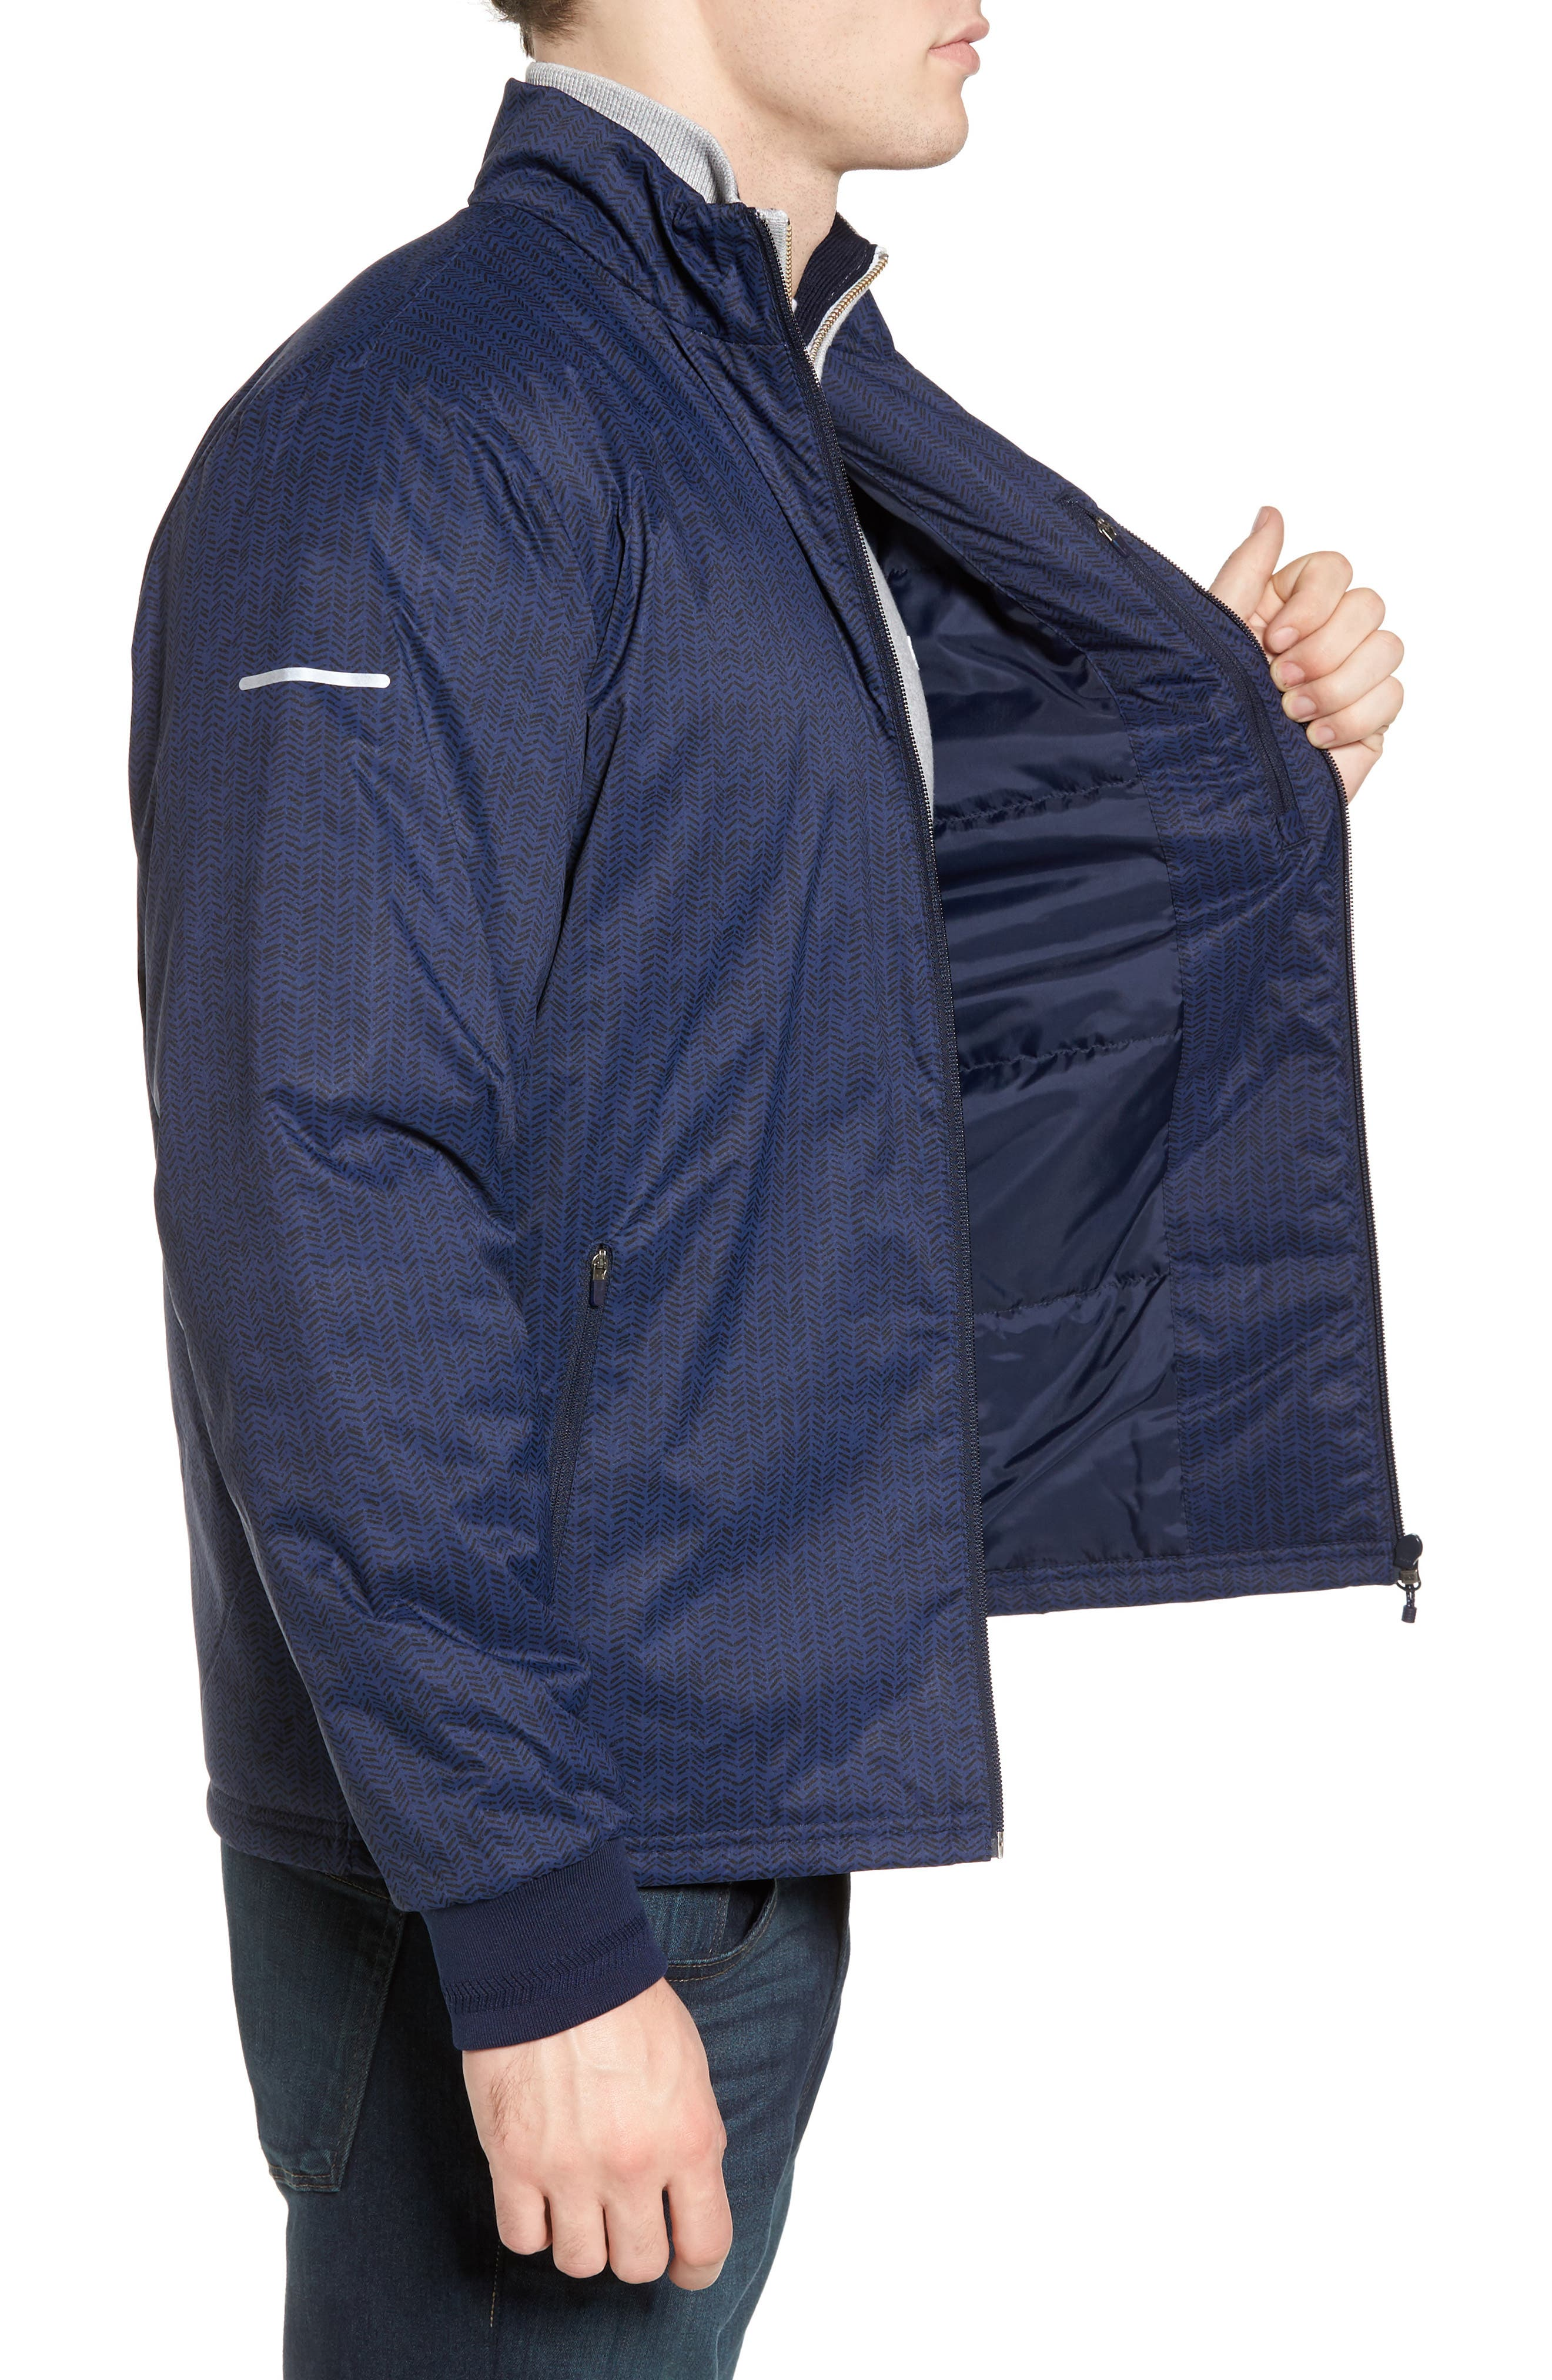 Herringbone Zip-Up Jacket,                             Alternate thumbnail 3, color,                             Navy Blue/ Navy Blue